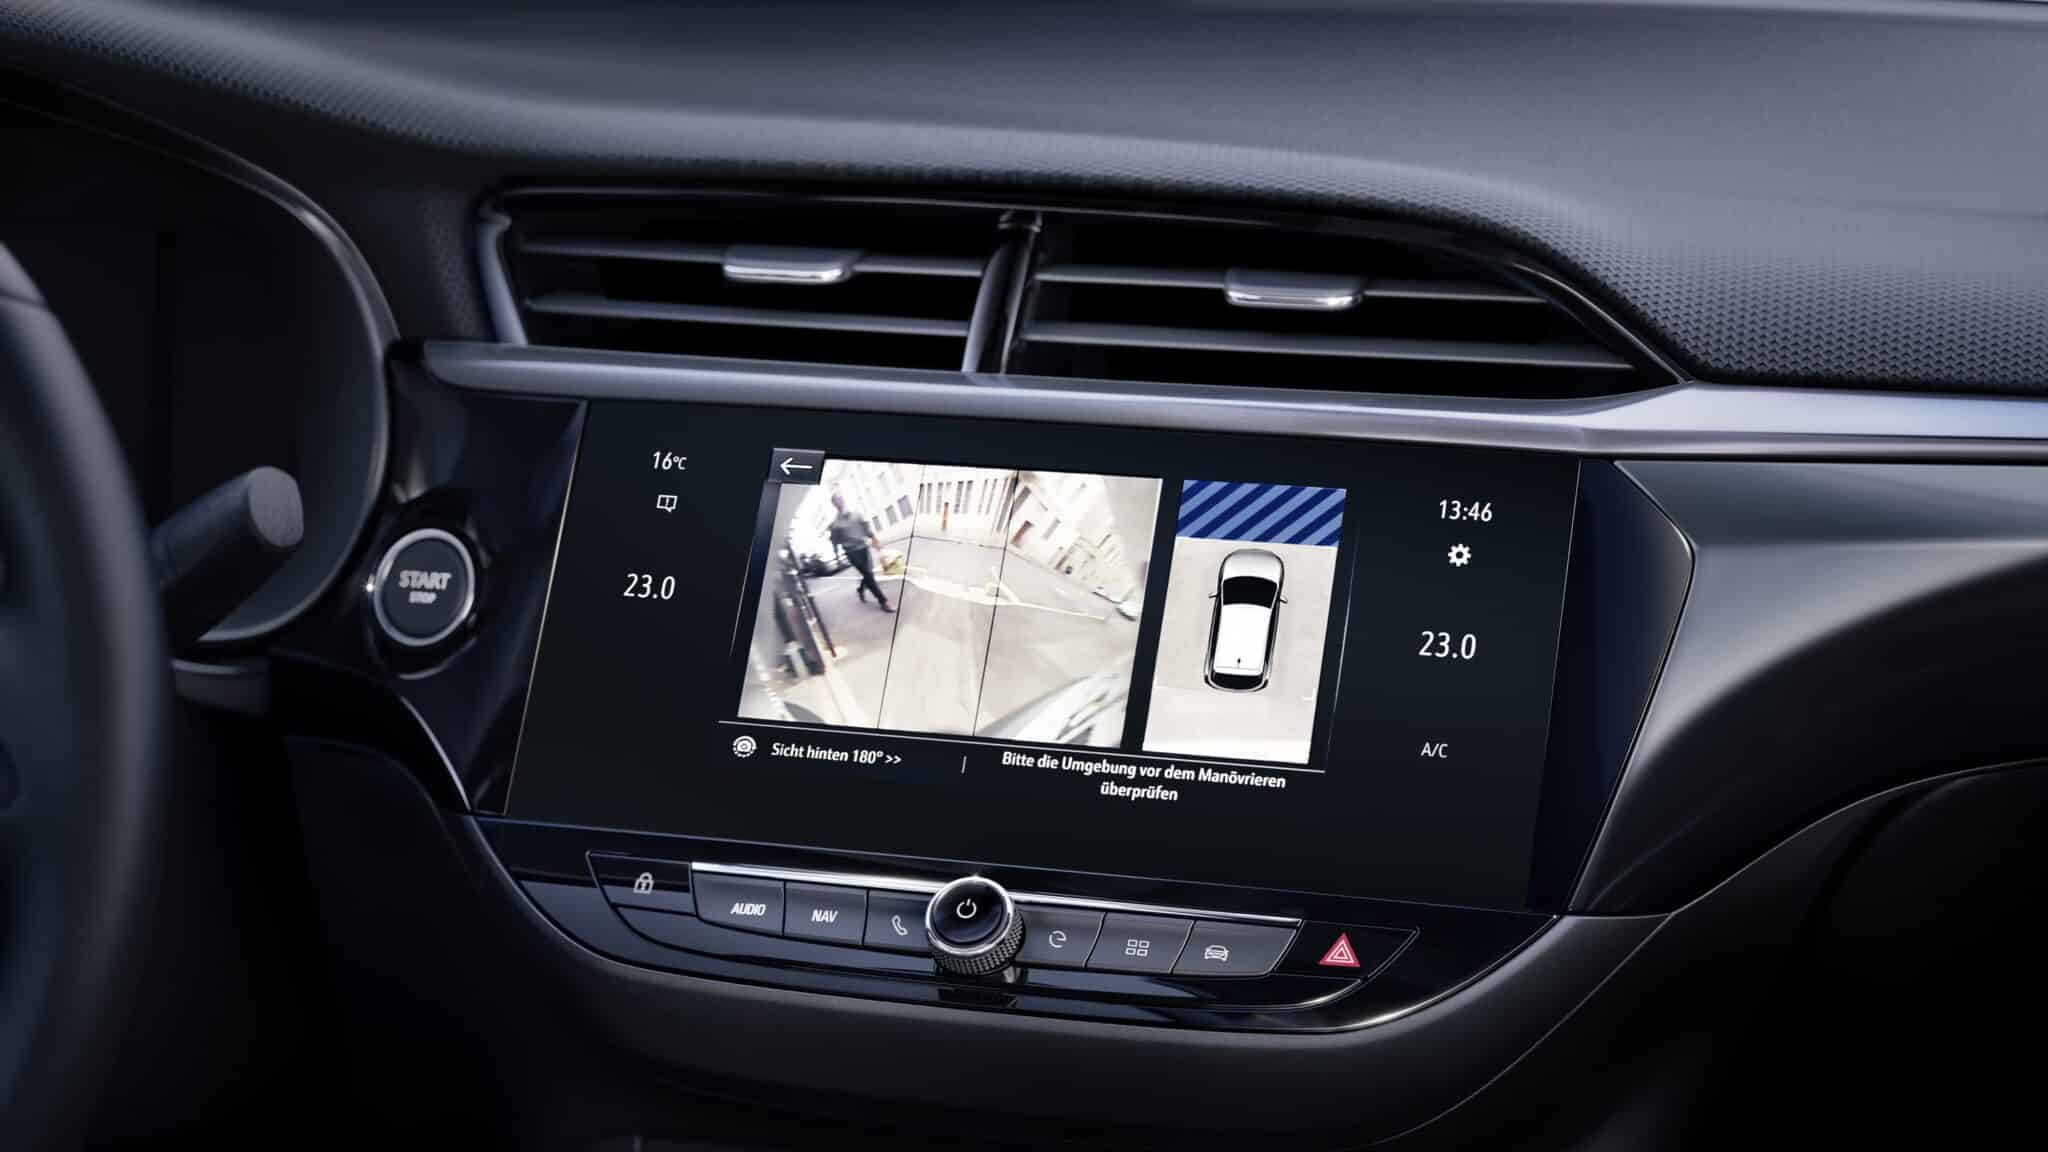 Opel Corsa E – ein Auto ohne Überraschungen? | 03 Opel Corsa e 506905 min scaled